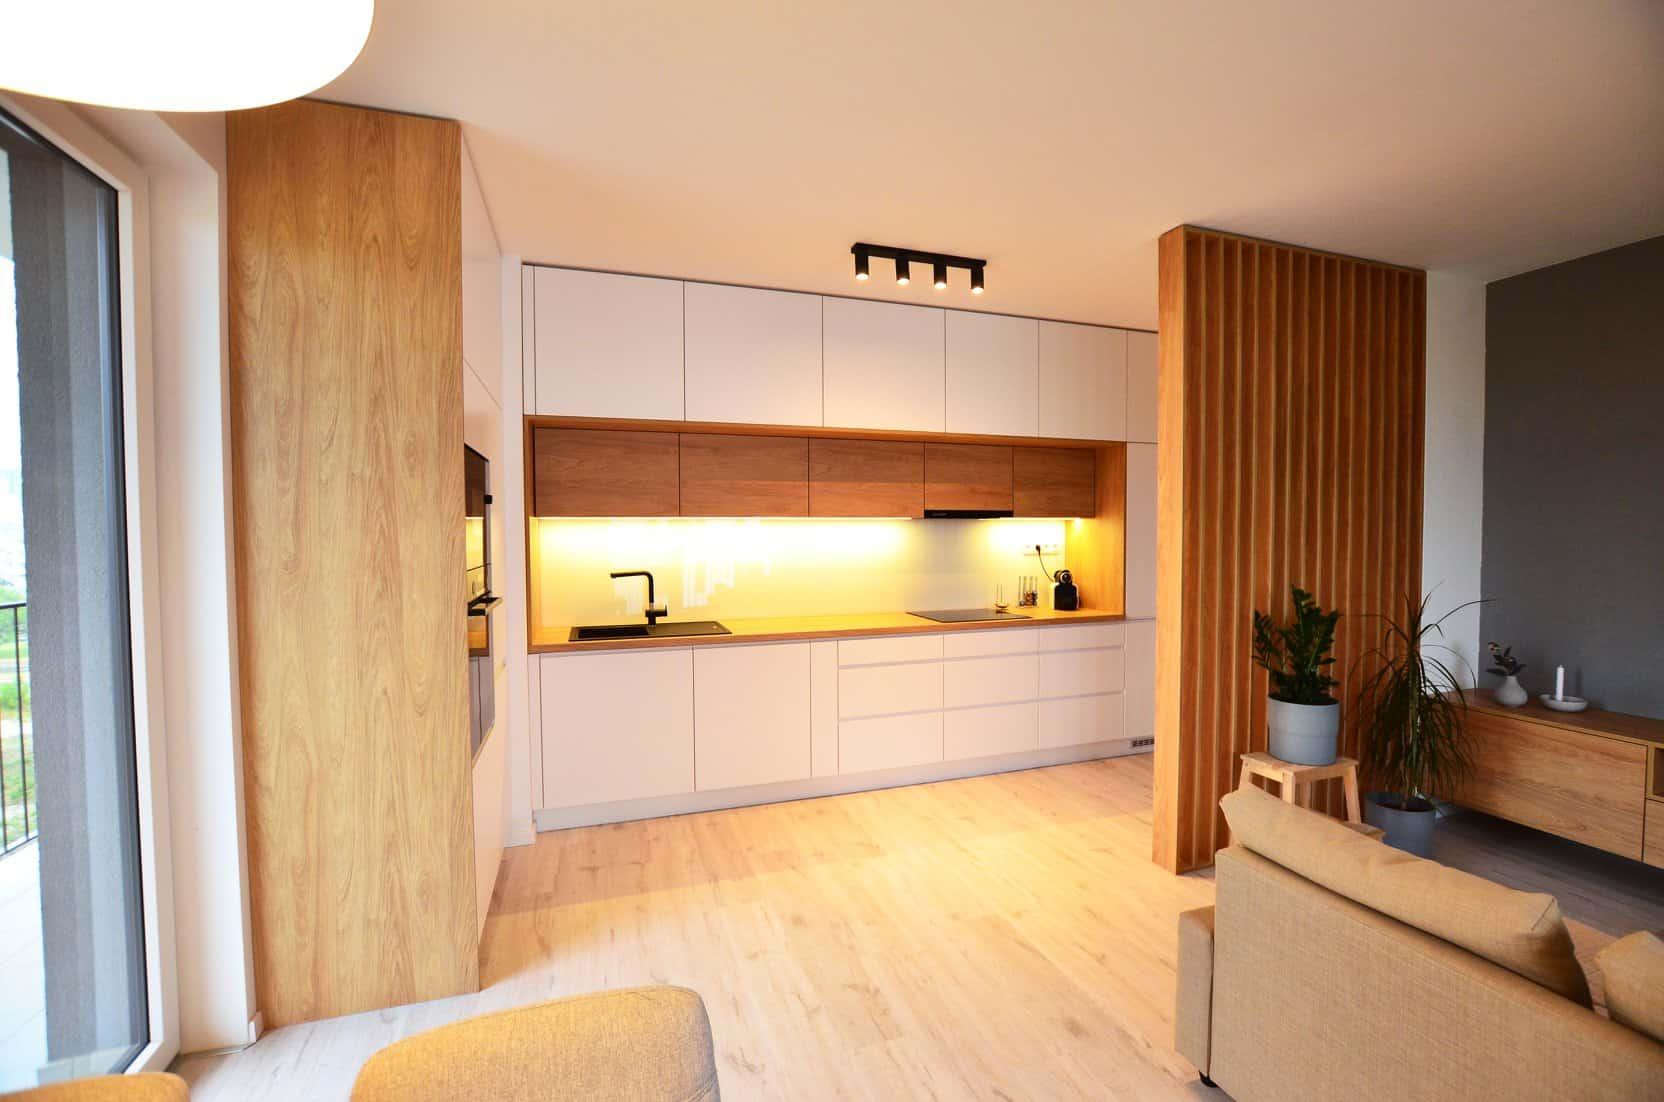 Kuchyna-drevena-stena-namieru